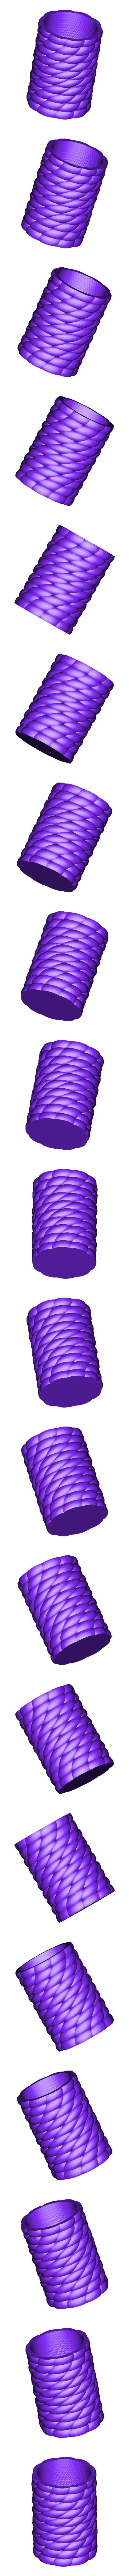 Bubble_Vase.stl Download free STL file Zortrax Vases • 3D printable design, Zortrax